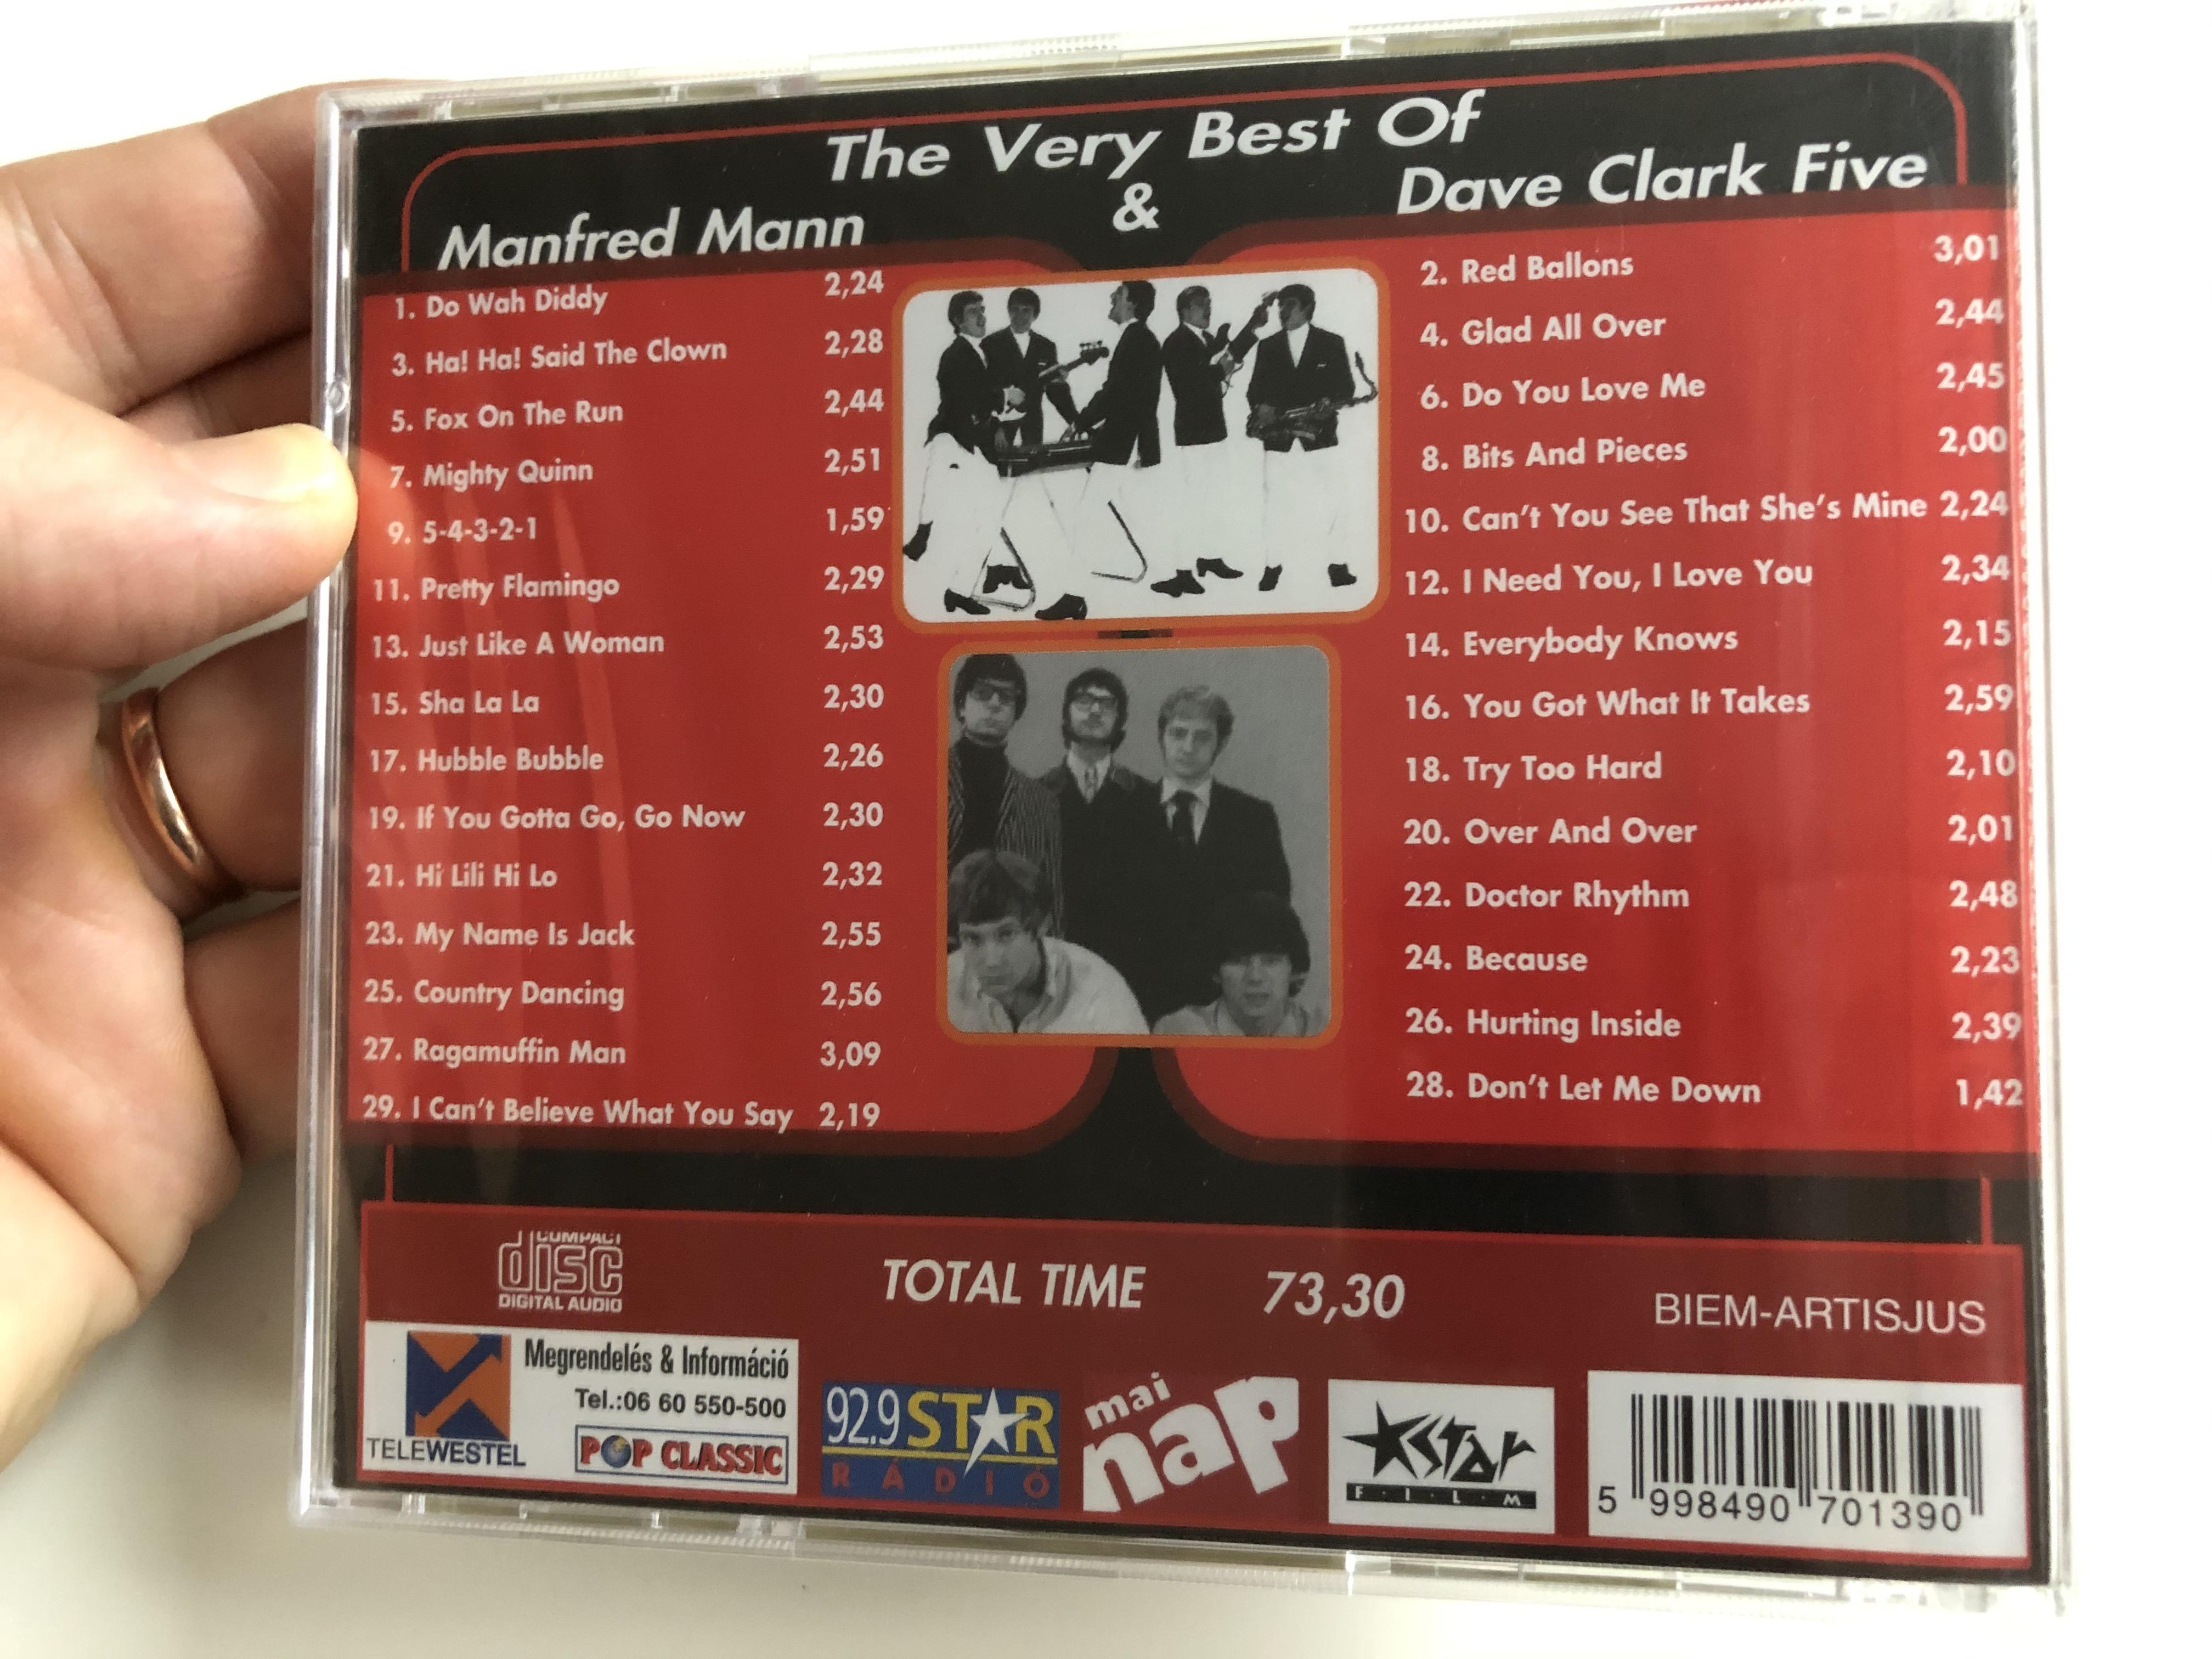 the-very-best-of-manfred-mann-dave-clark-five-pop-classic-euroton-audio-cd-eucd-0139-2-.jpg